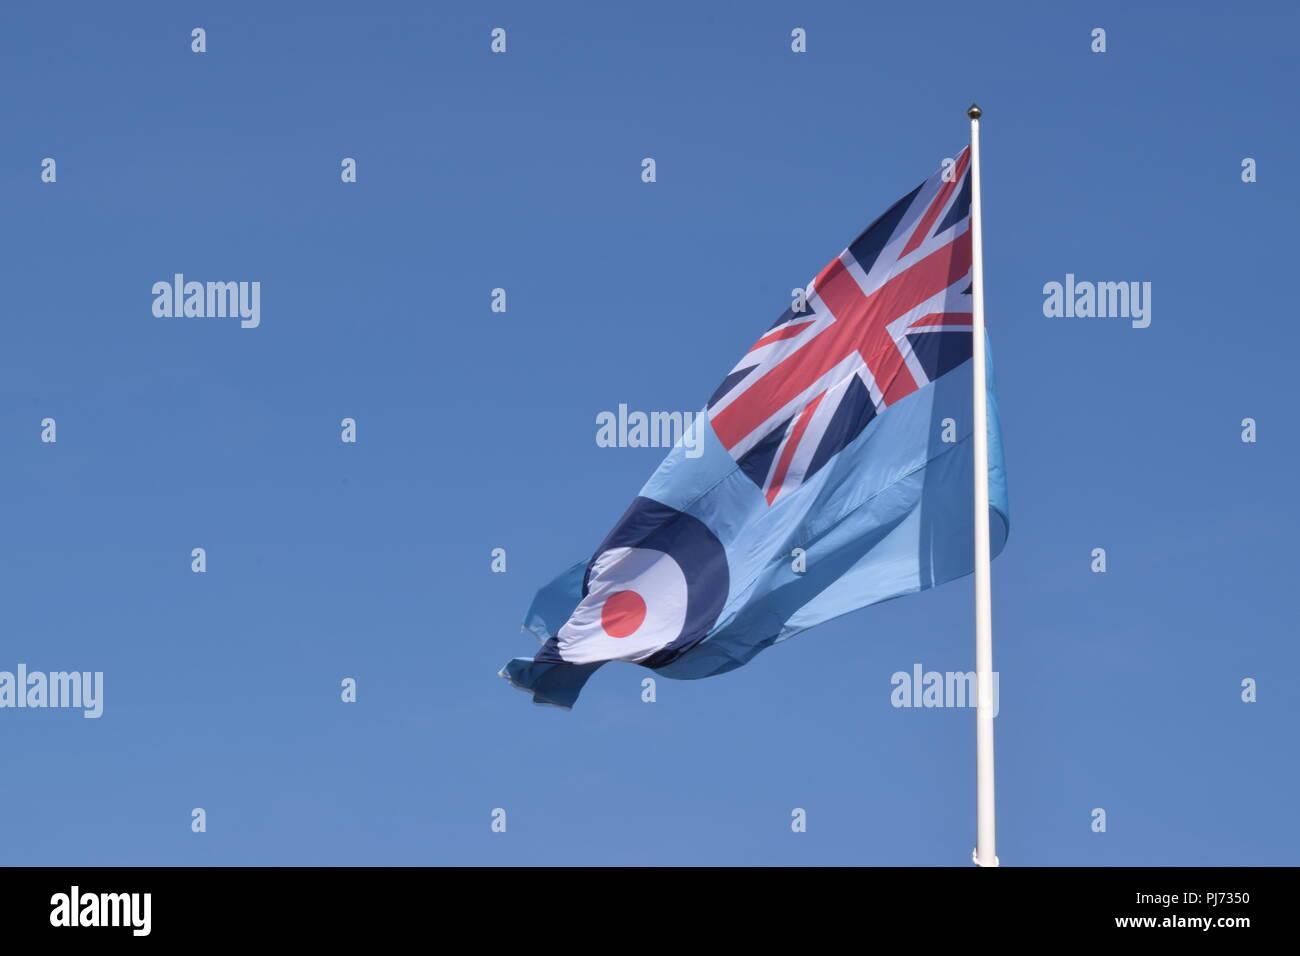 RAF 100 year anniversary flag - Stock Image